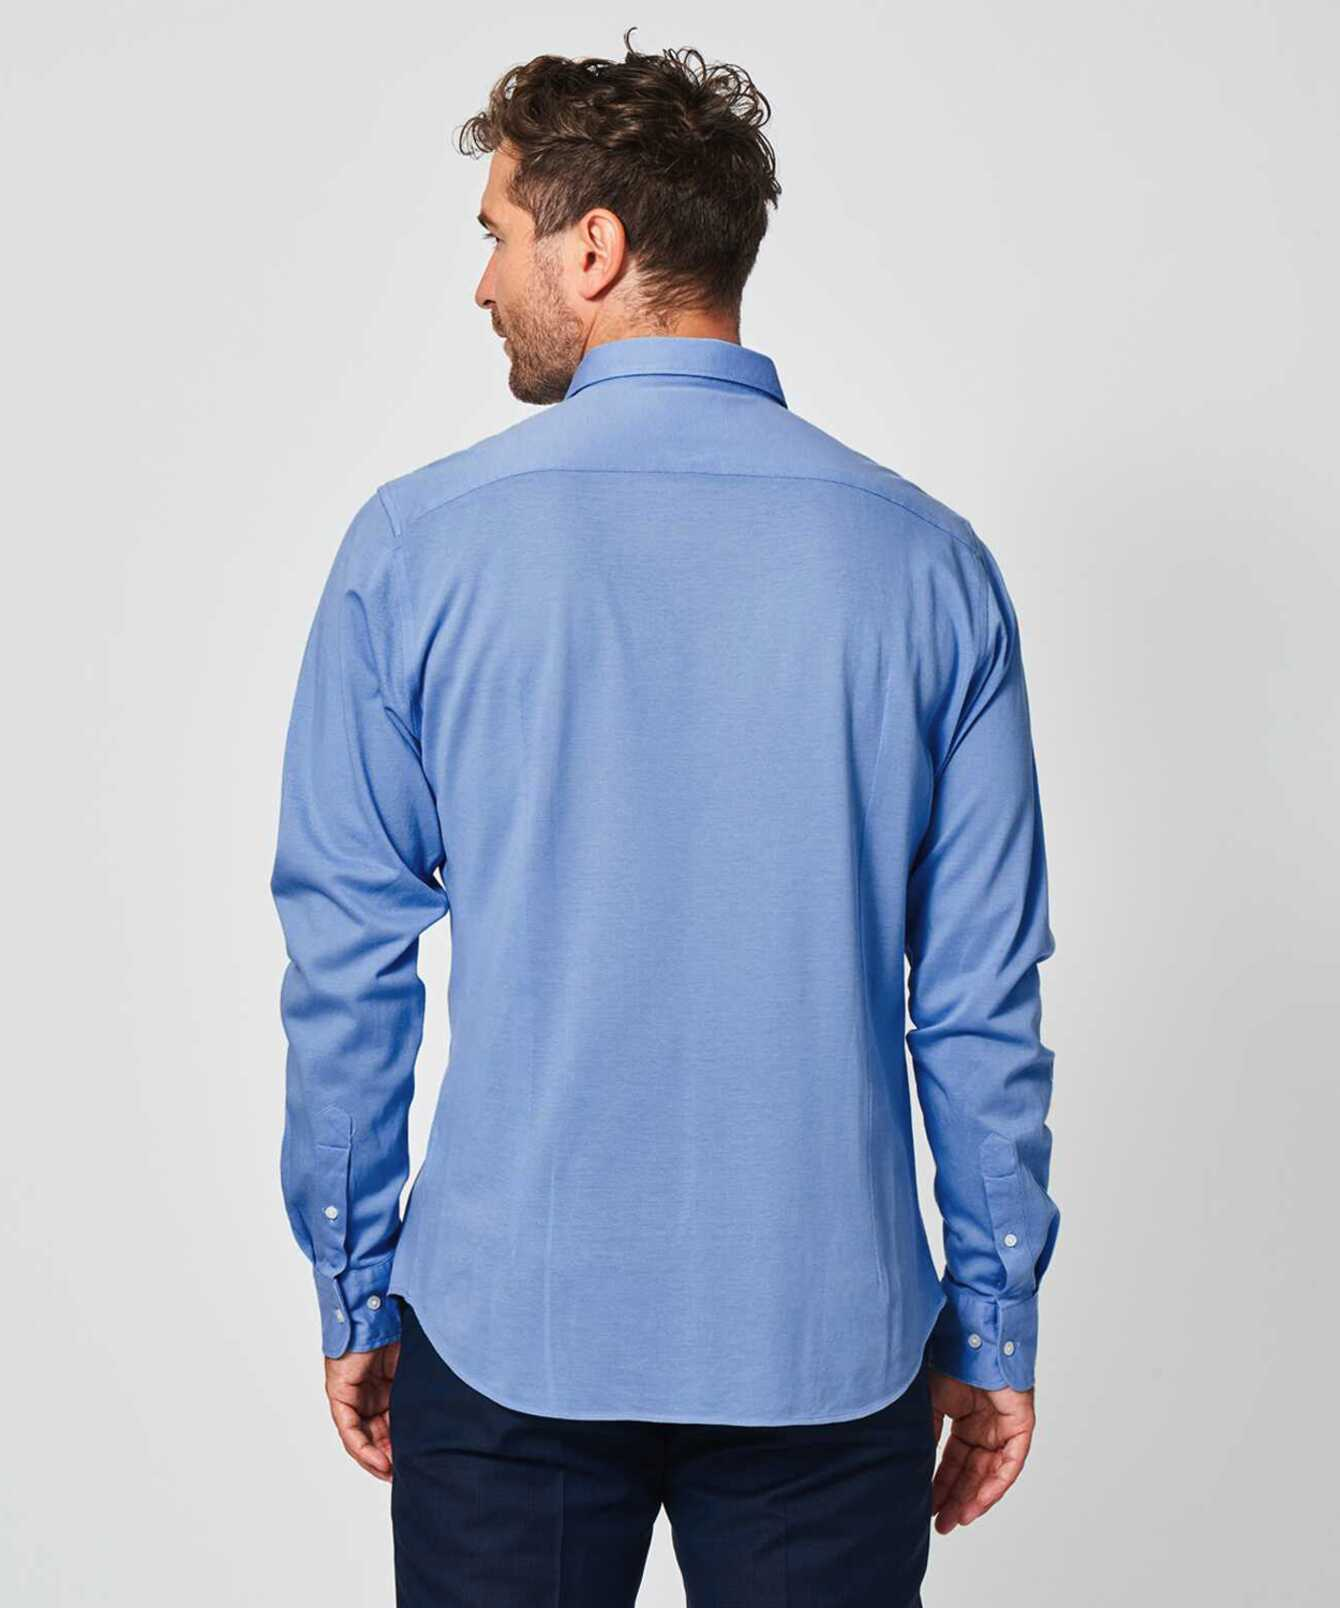 Shirt Royal Troon Pique Ljusblå The Shirt Factory